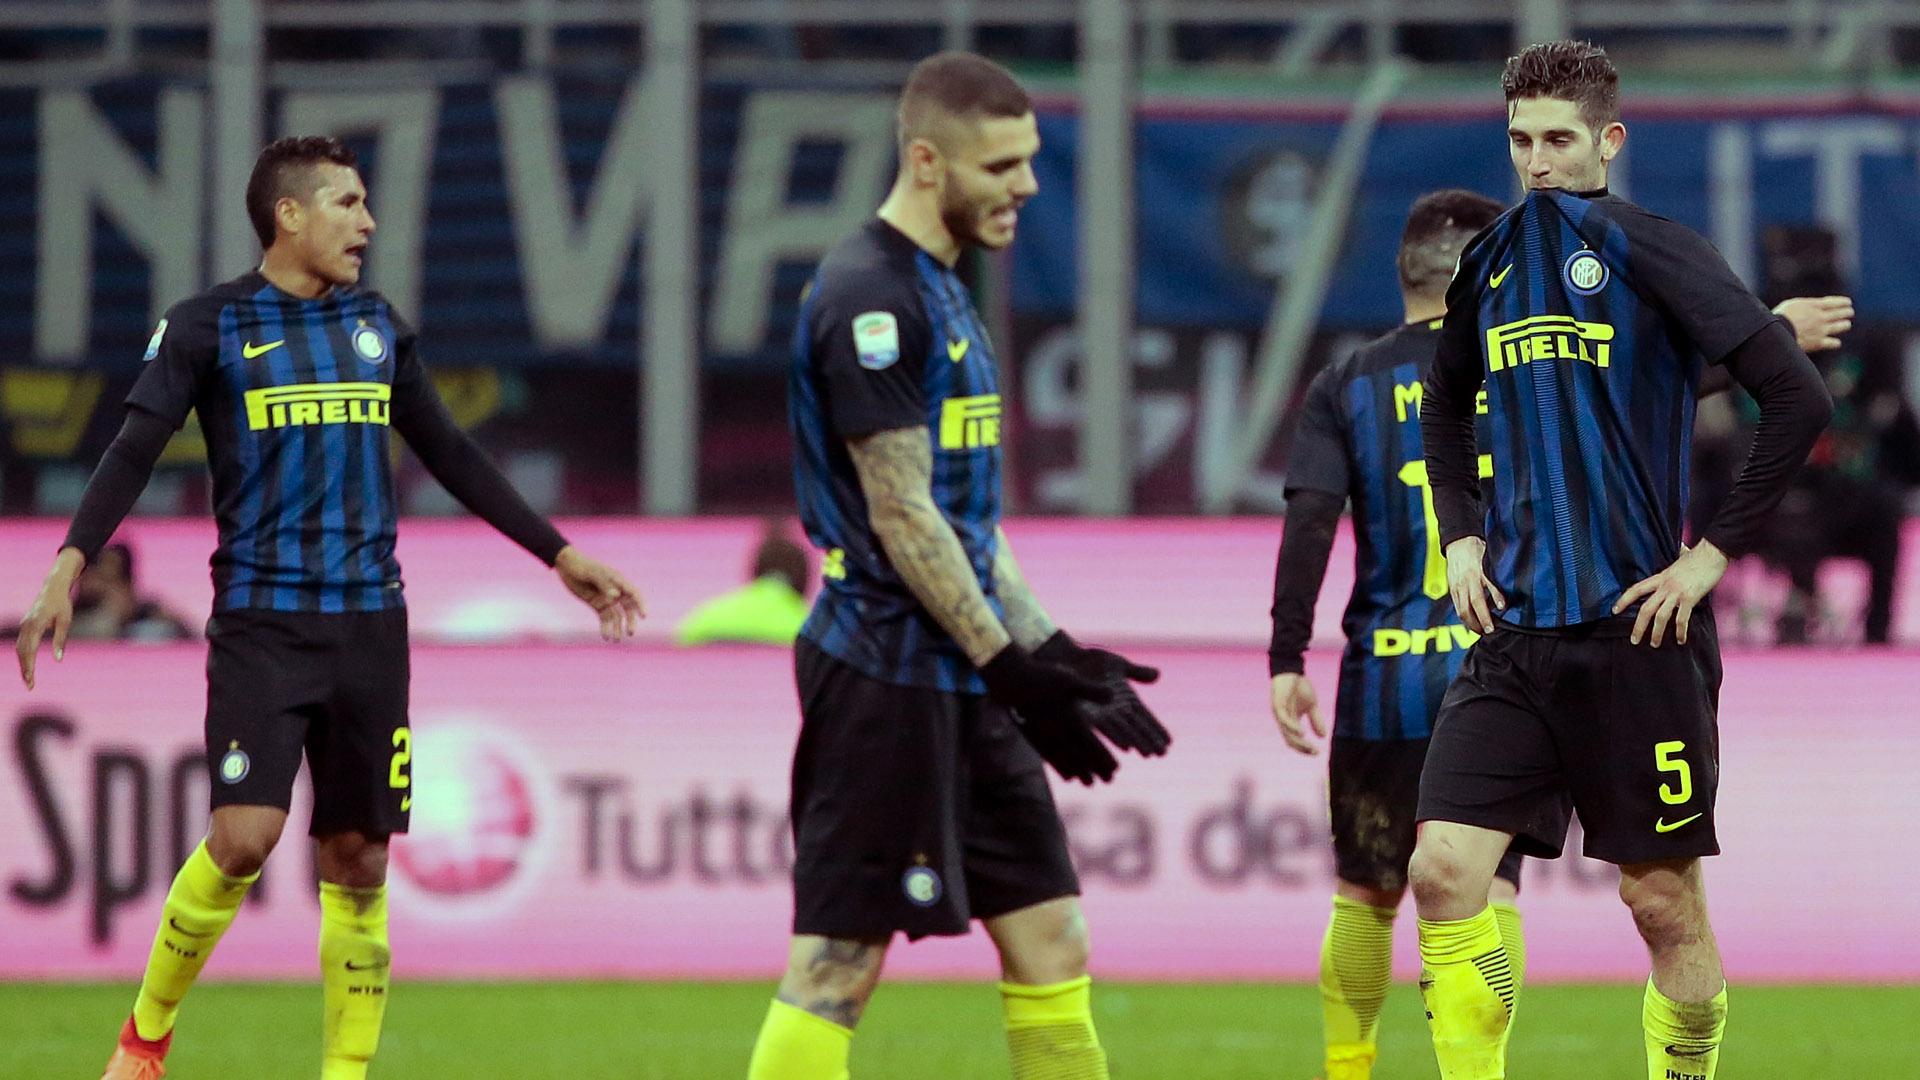 Jogadores da Inter lamentam (Photo by Emilio Andreoli/Getty Images )